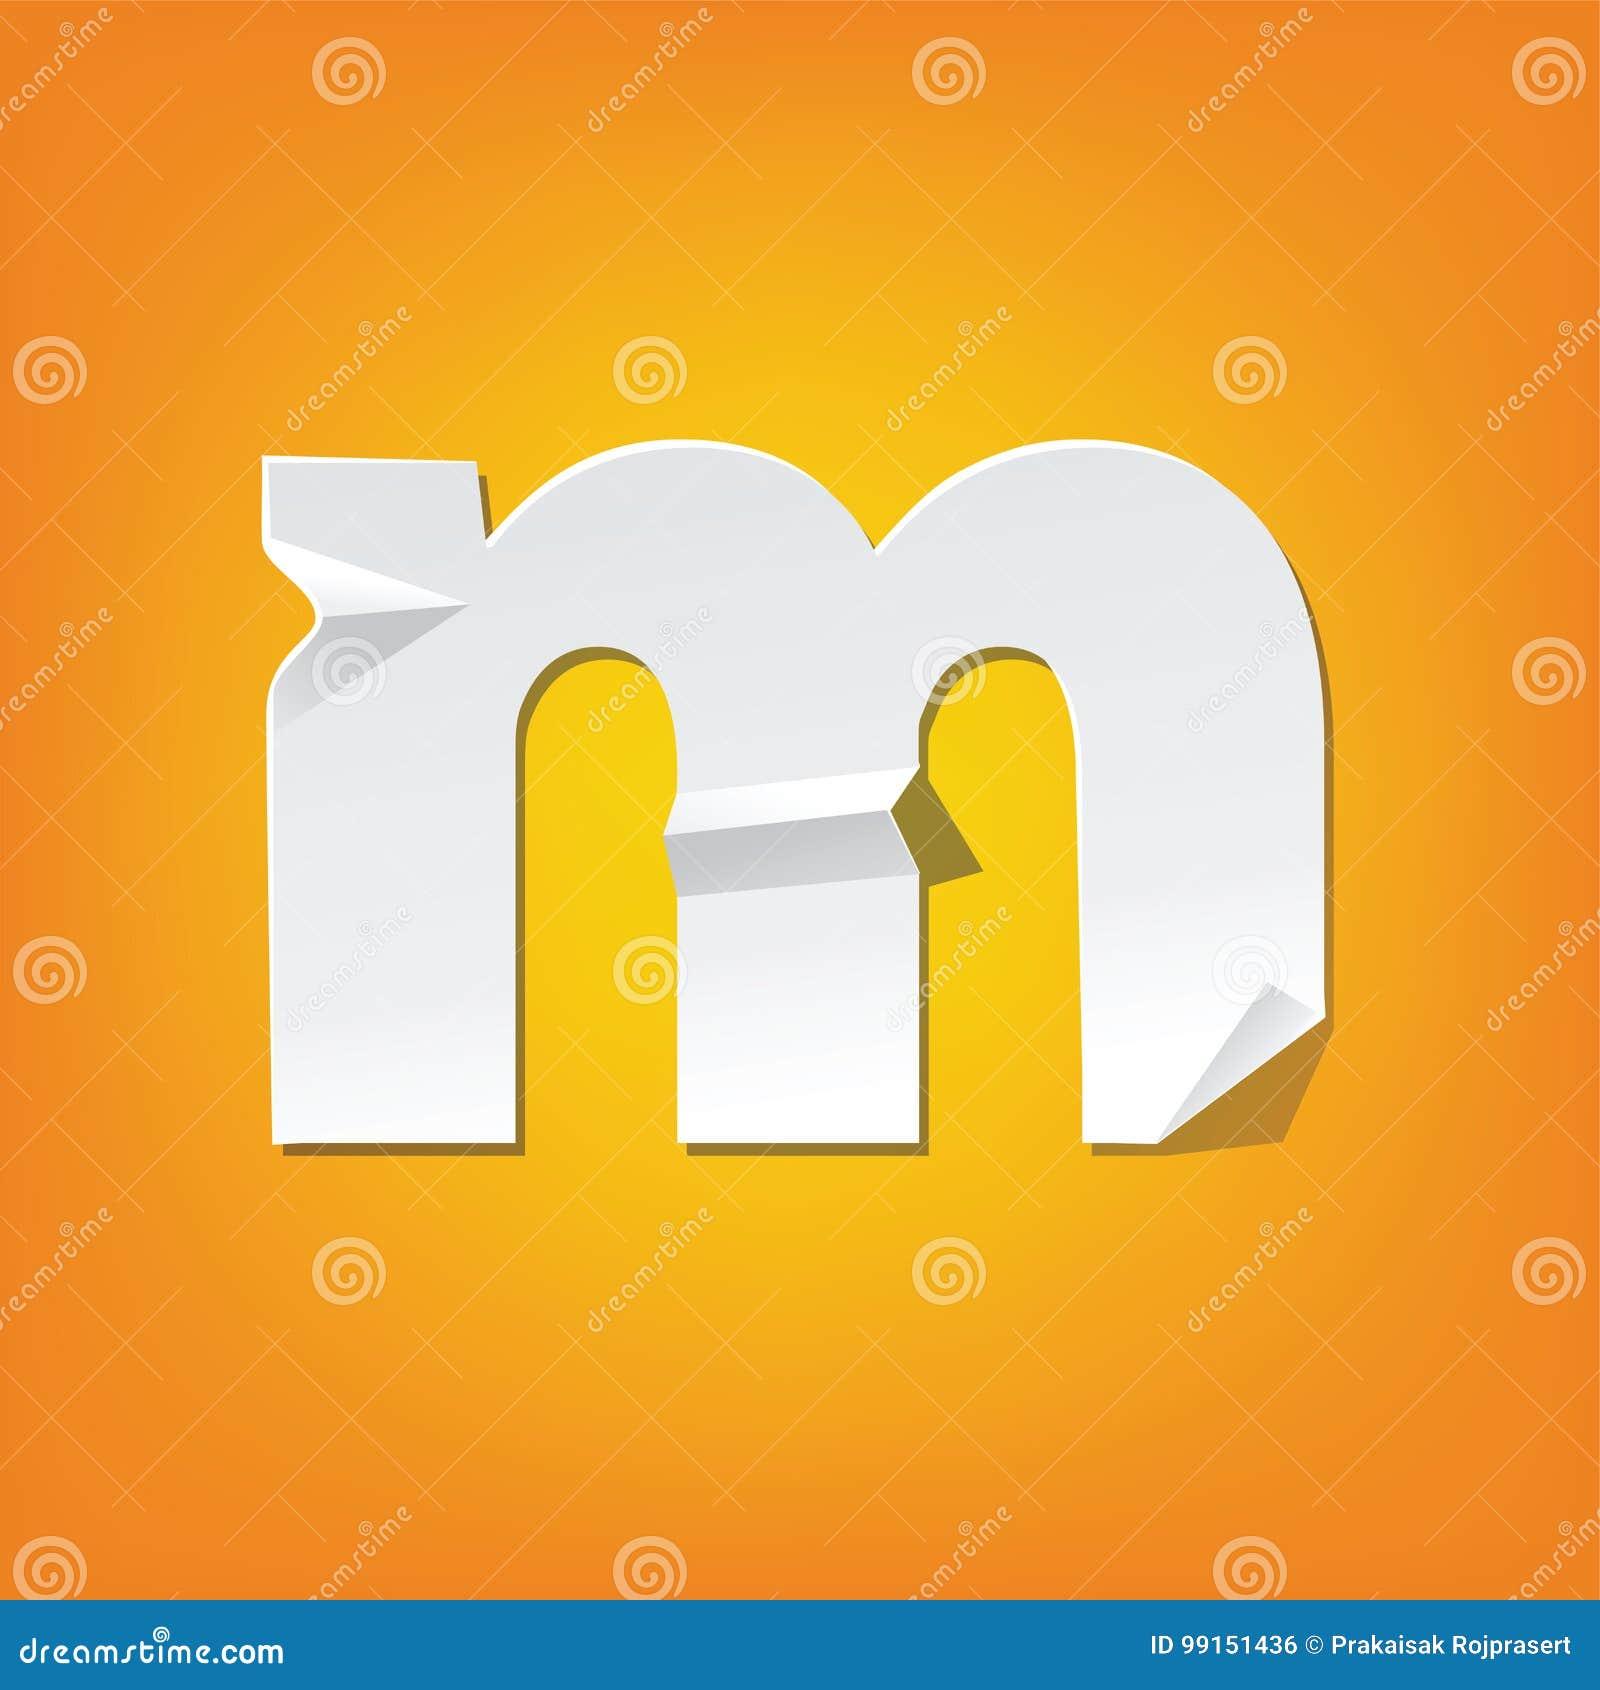 M Lowercase Letter Fold English Alphabet Design Stock Vector